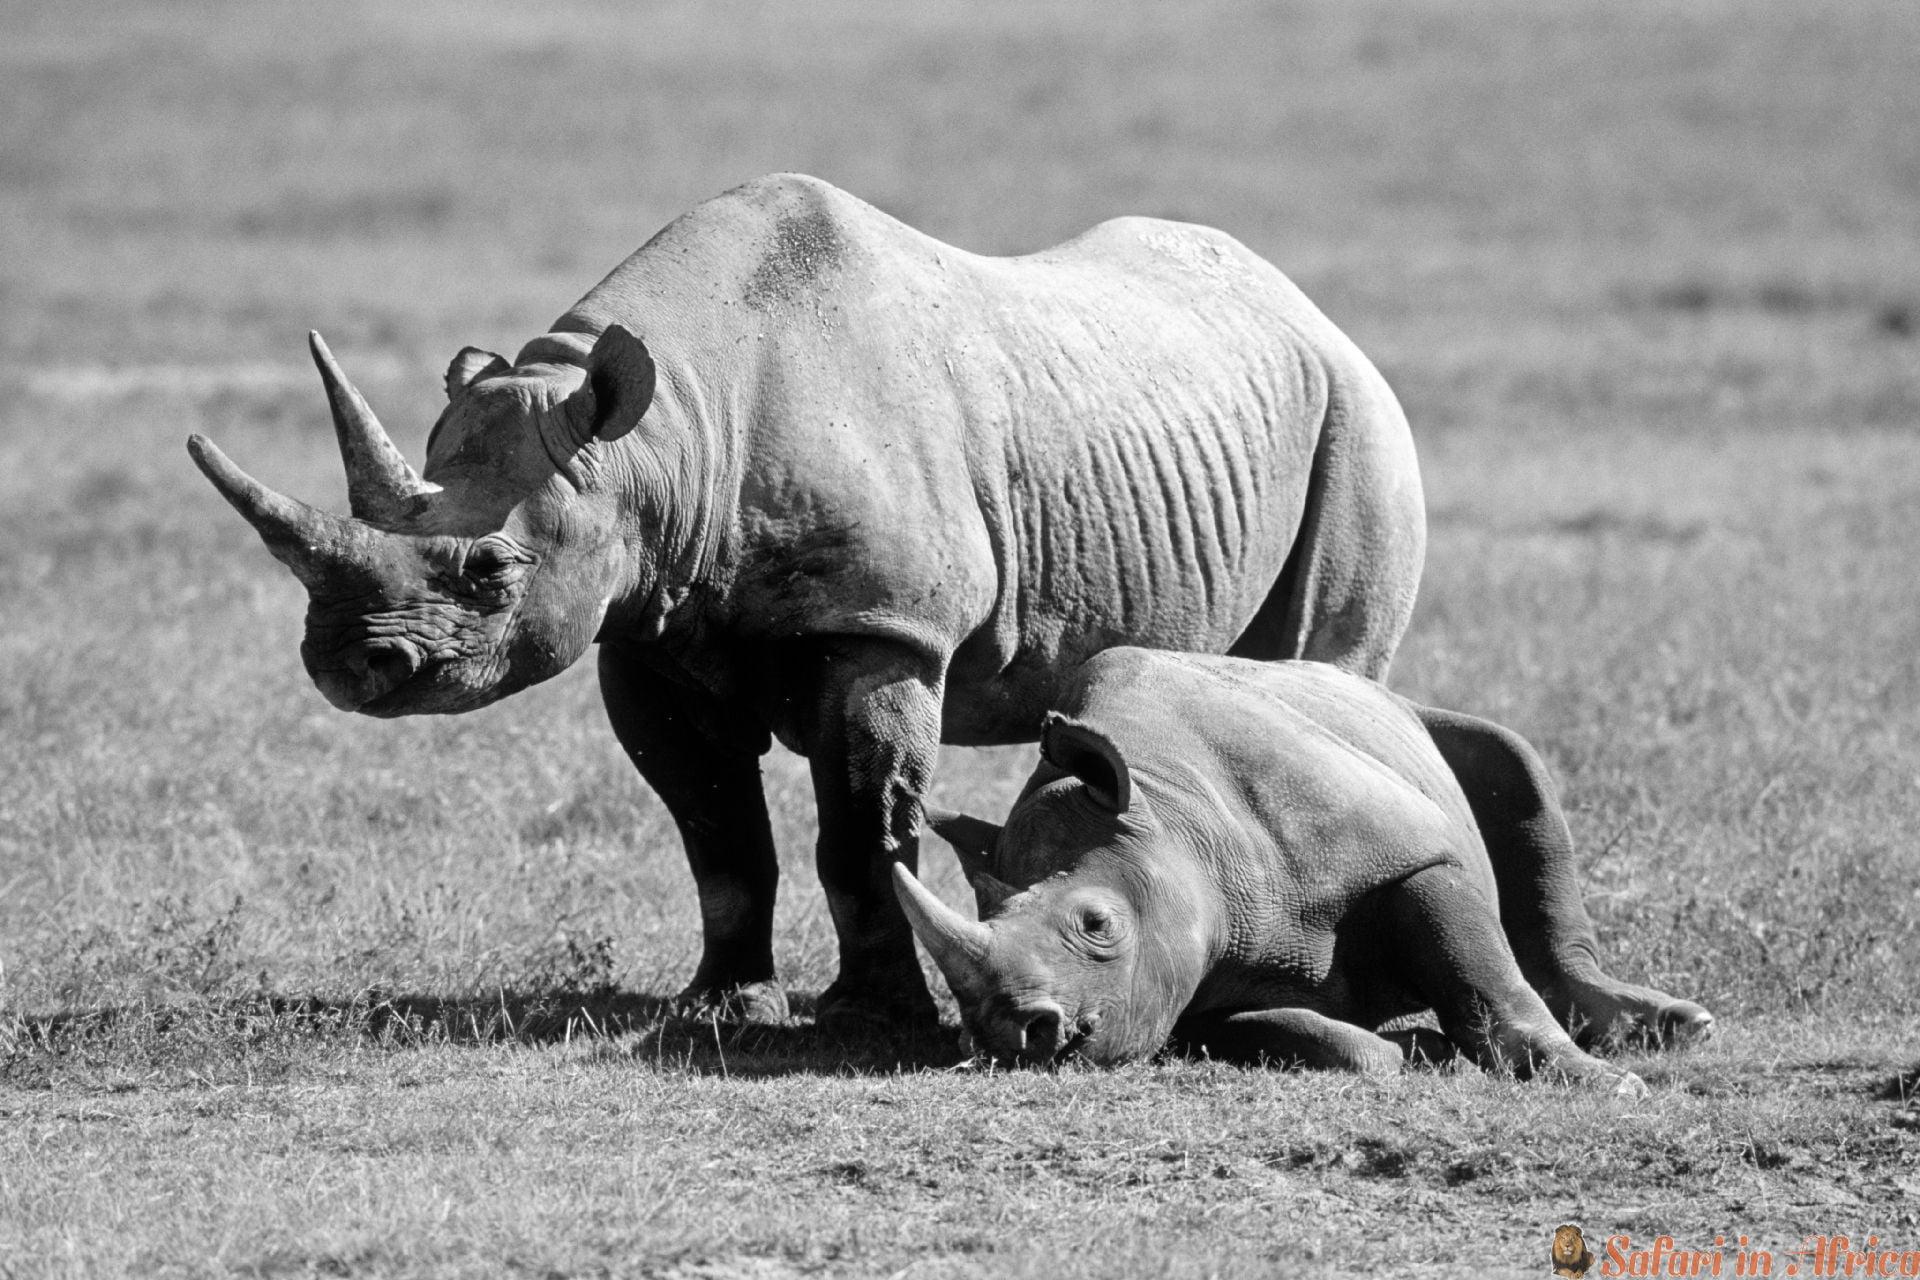 Rhino, Ngorongoro, Tanzania B&W